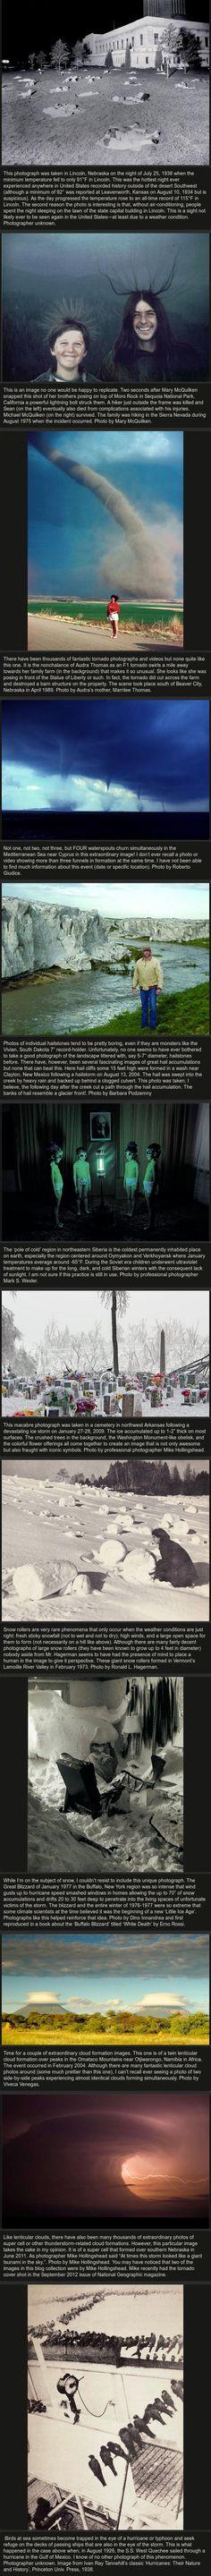 10 highly unusual weather events in History unusu weather, unusual history, 10 high, high unusu, weather event